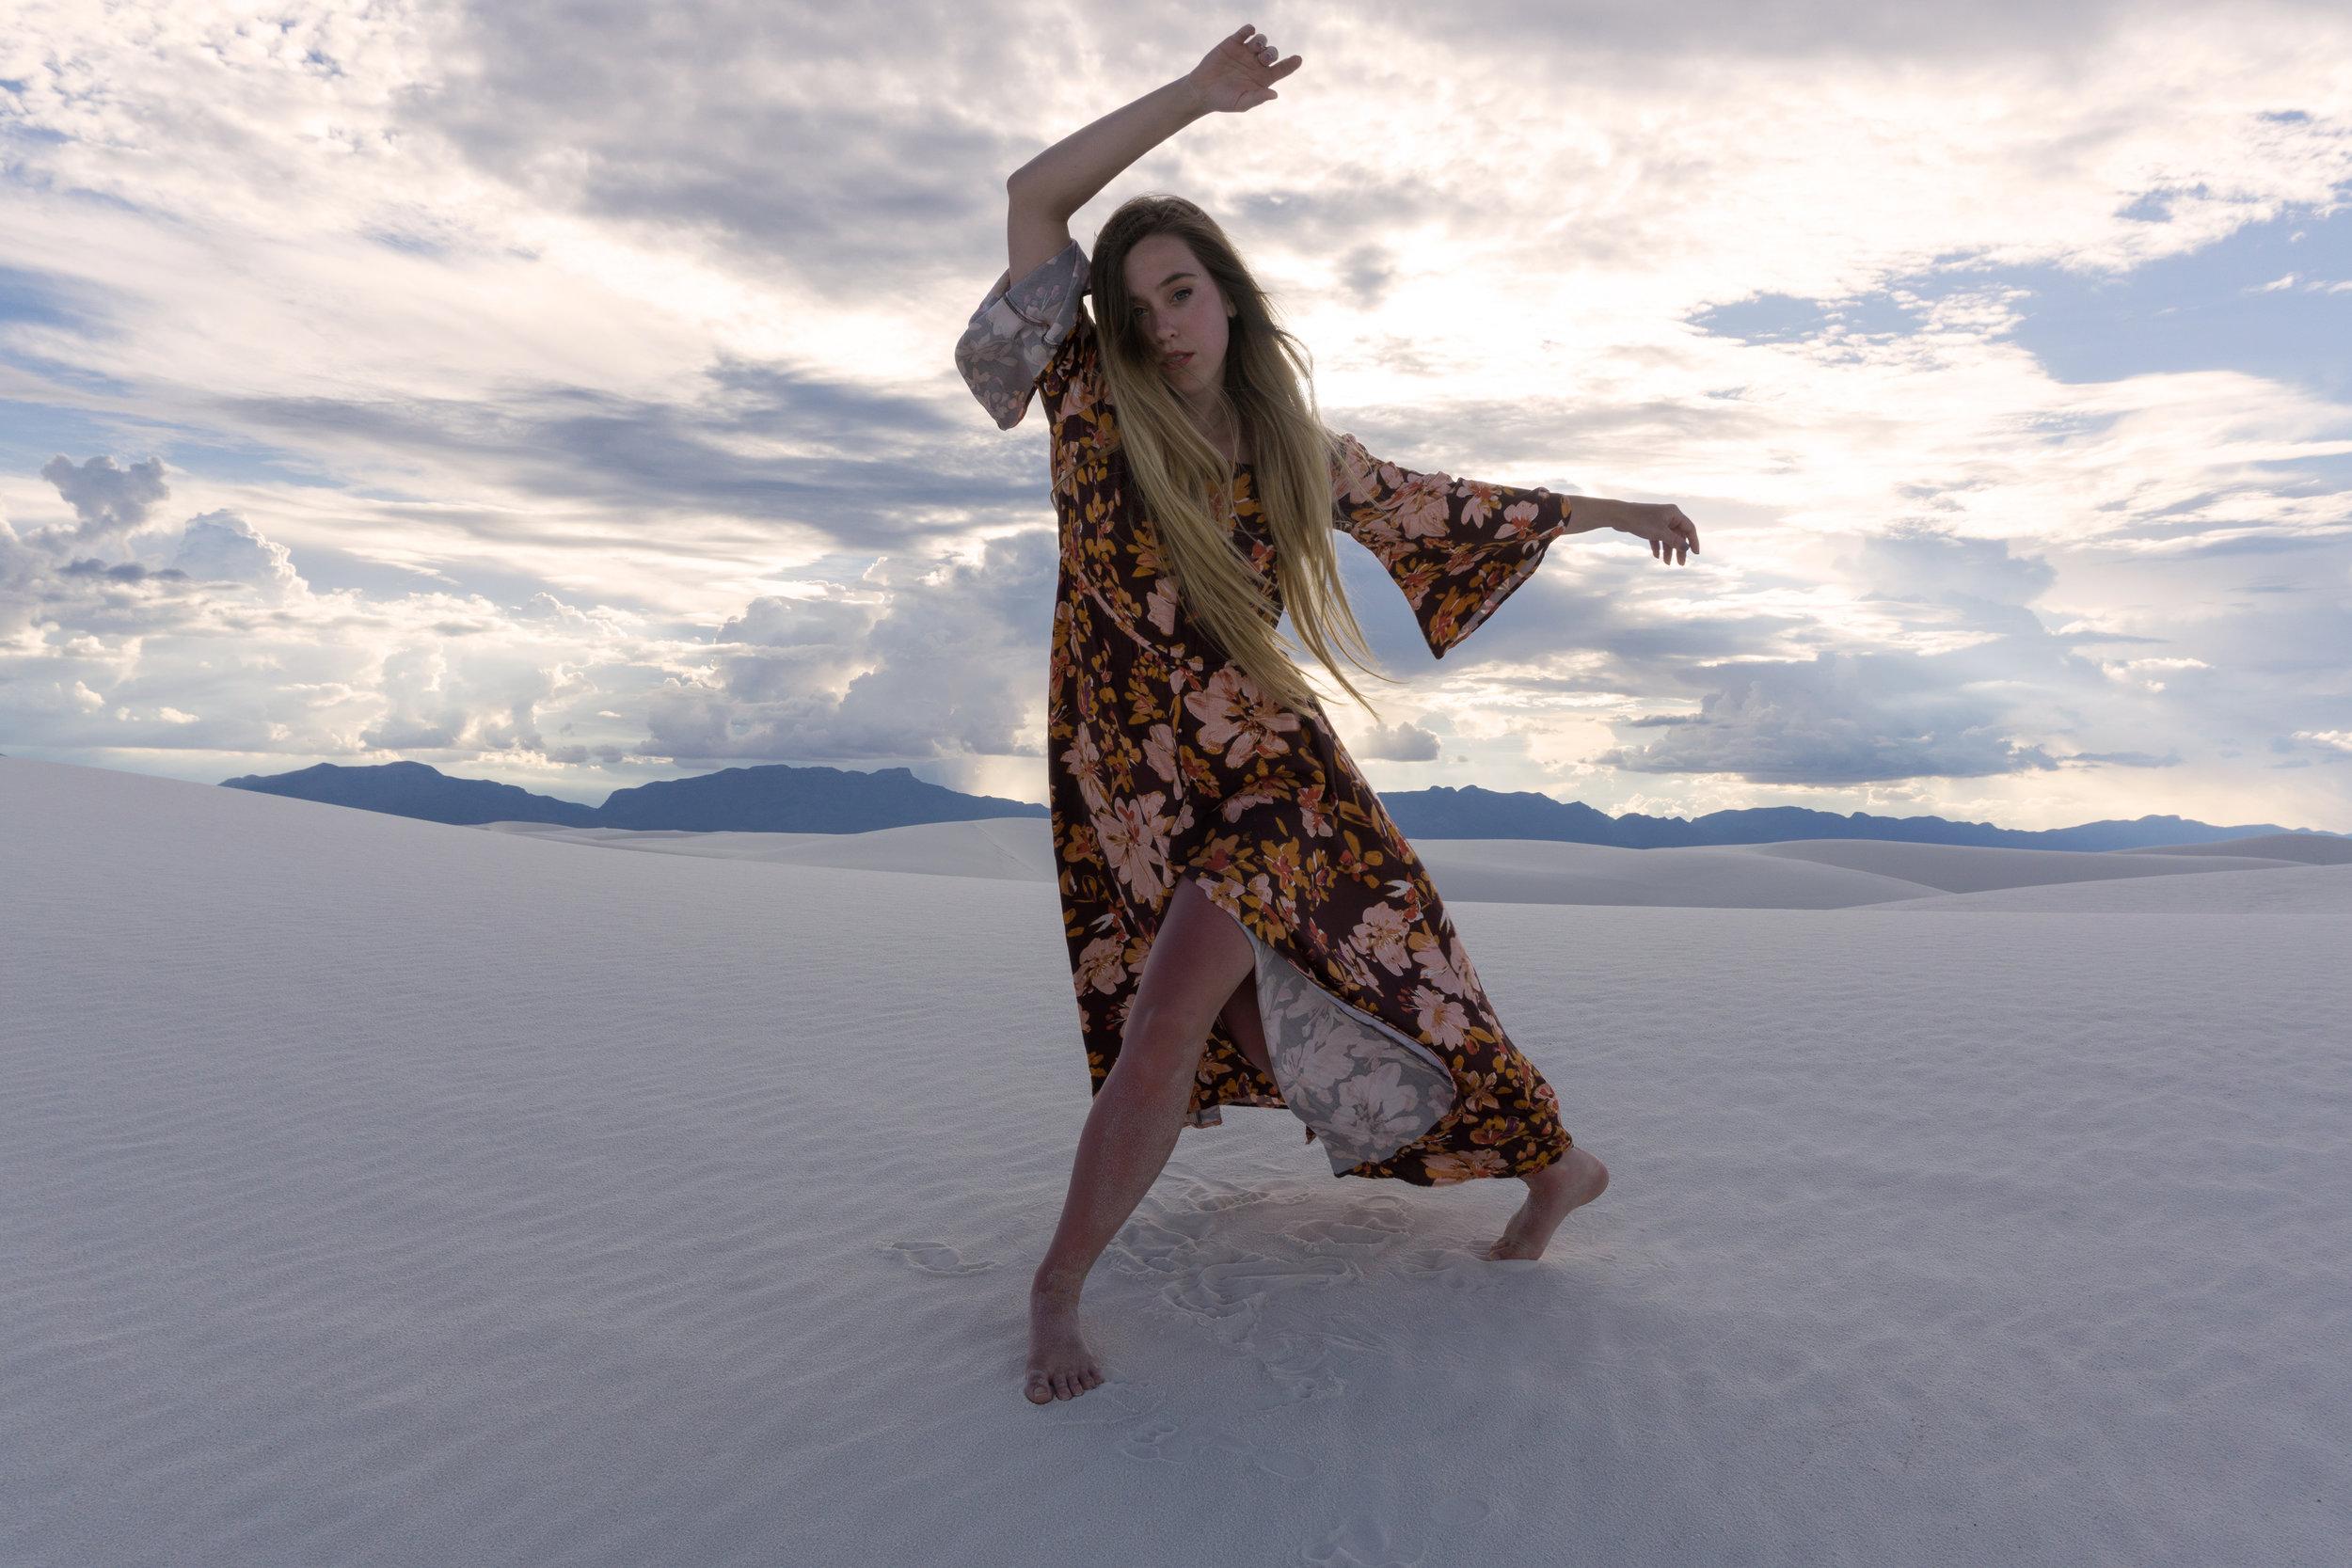 AstroBandit_JordanRose_WhiteSands_Dancing_Dancer_SomedaysLovin_GypsumSand_6.jpg